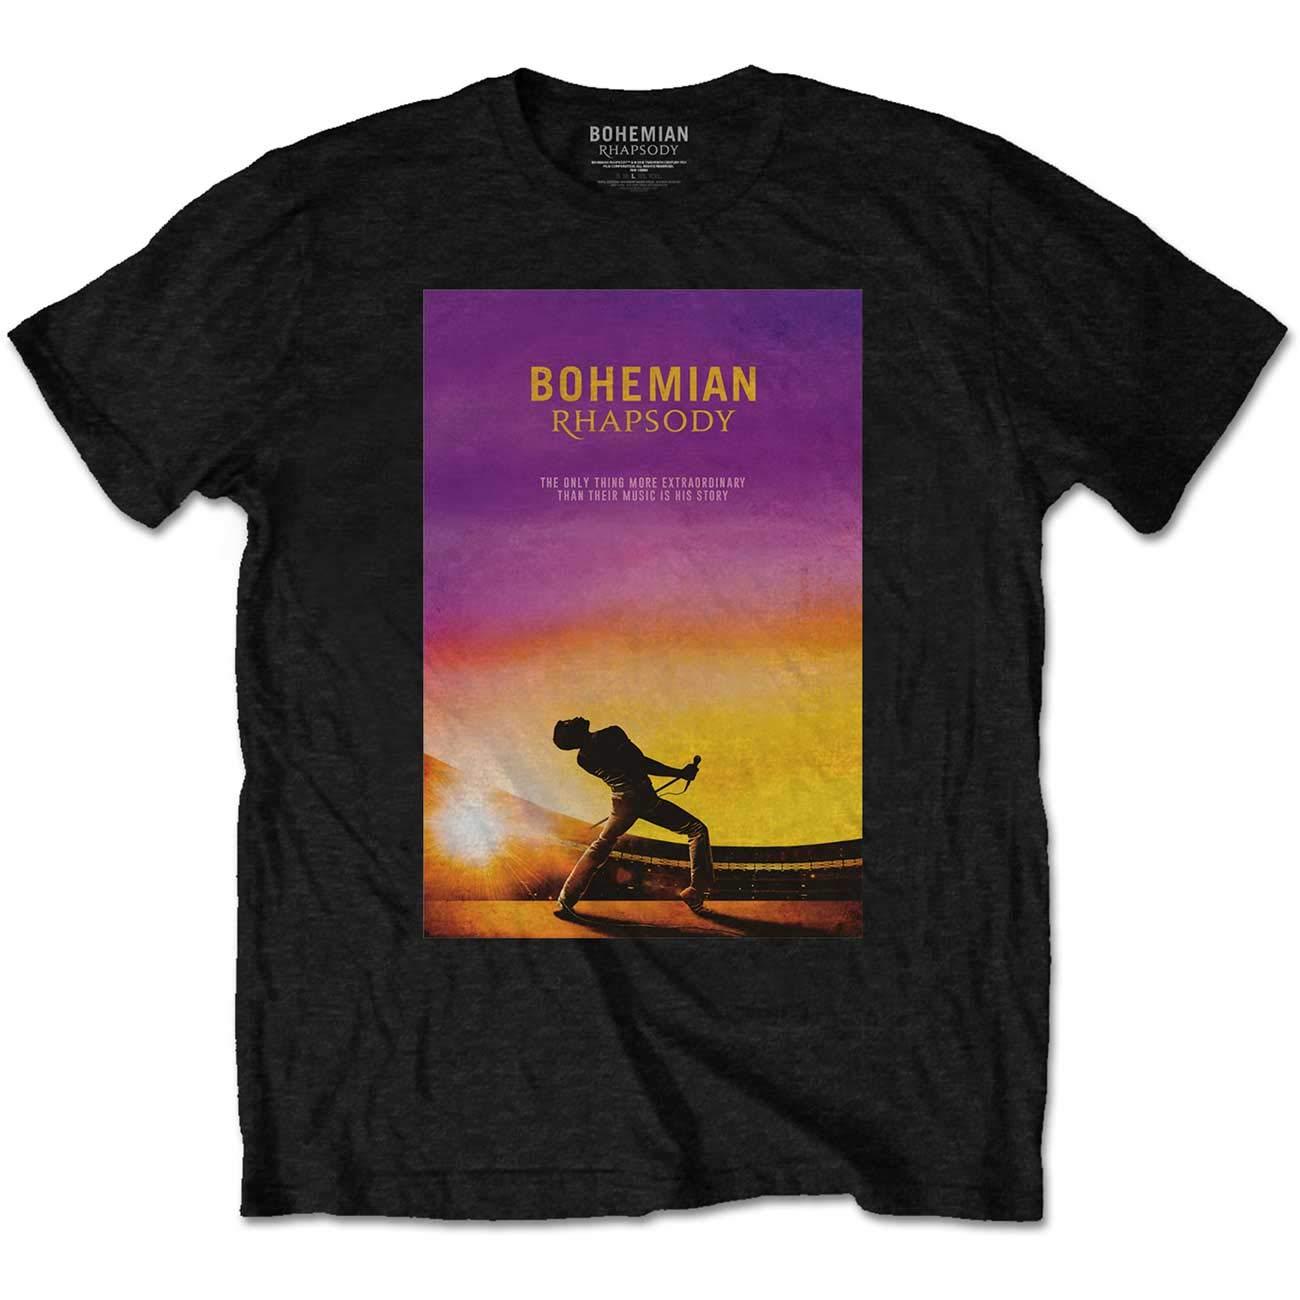 Queen Fdie Mercury Bohemian Rhapsody Pose Tee T Shirt S Unisex 5068